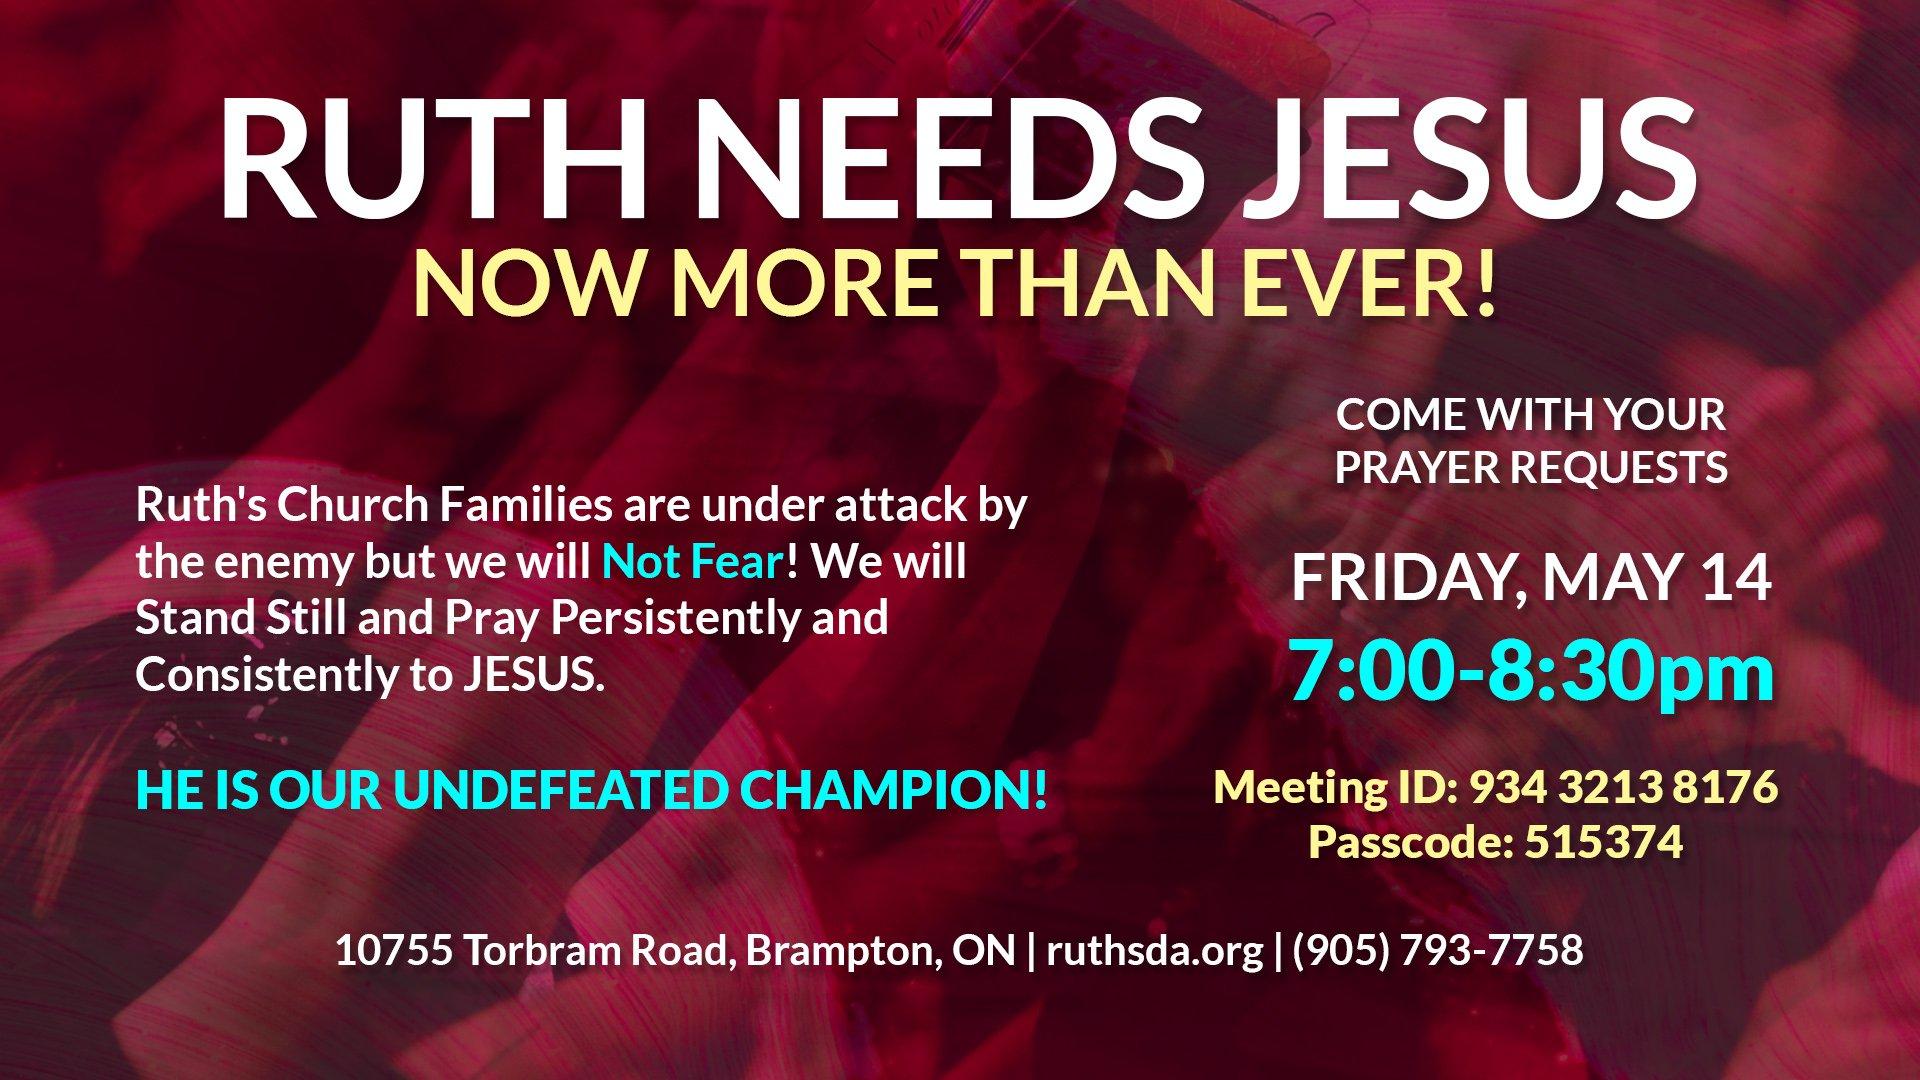 Ruth Needs Jesus - Friday Day Prayer